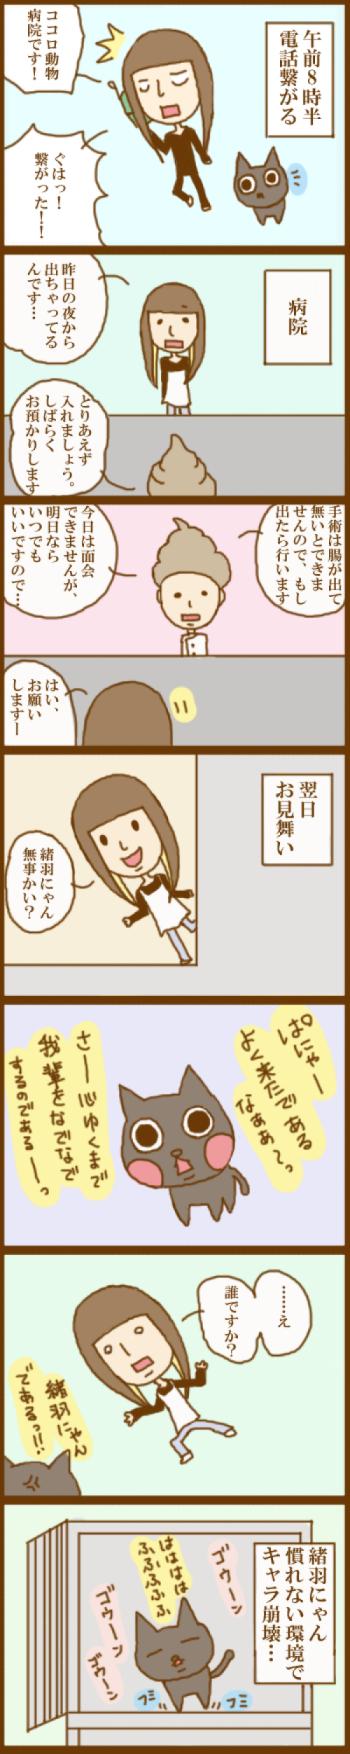 f:id:suzuokayu:20201117092233j:plain